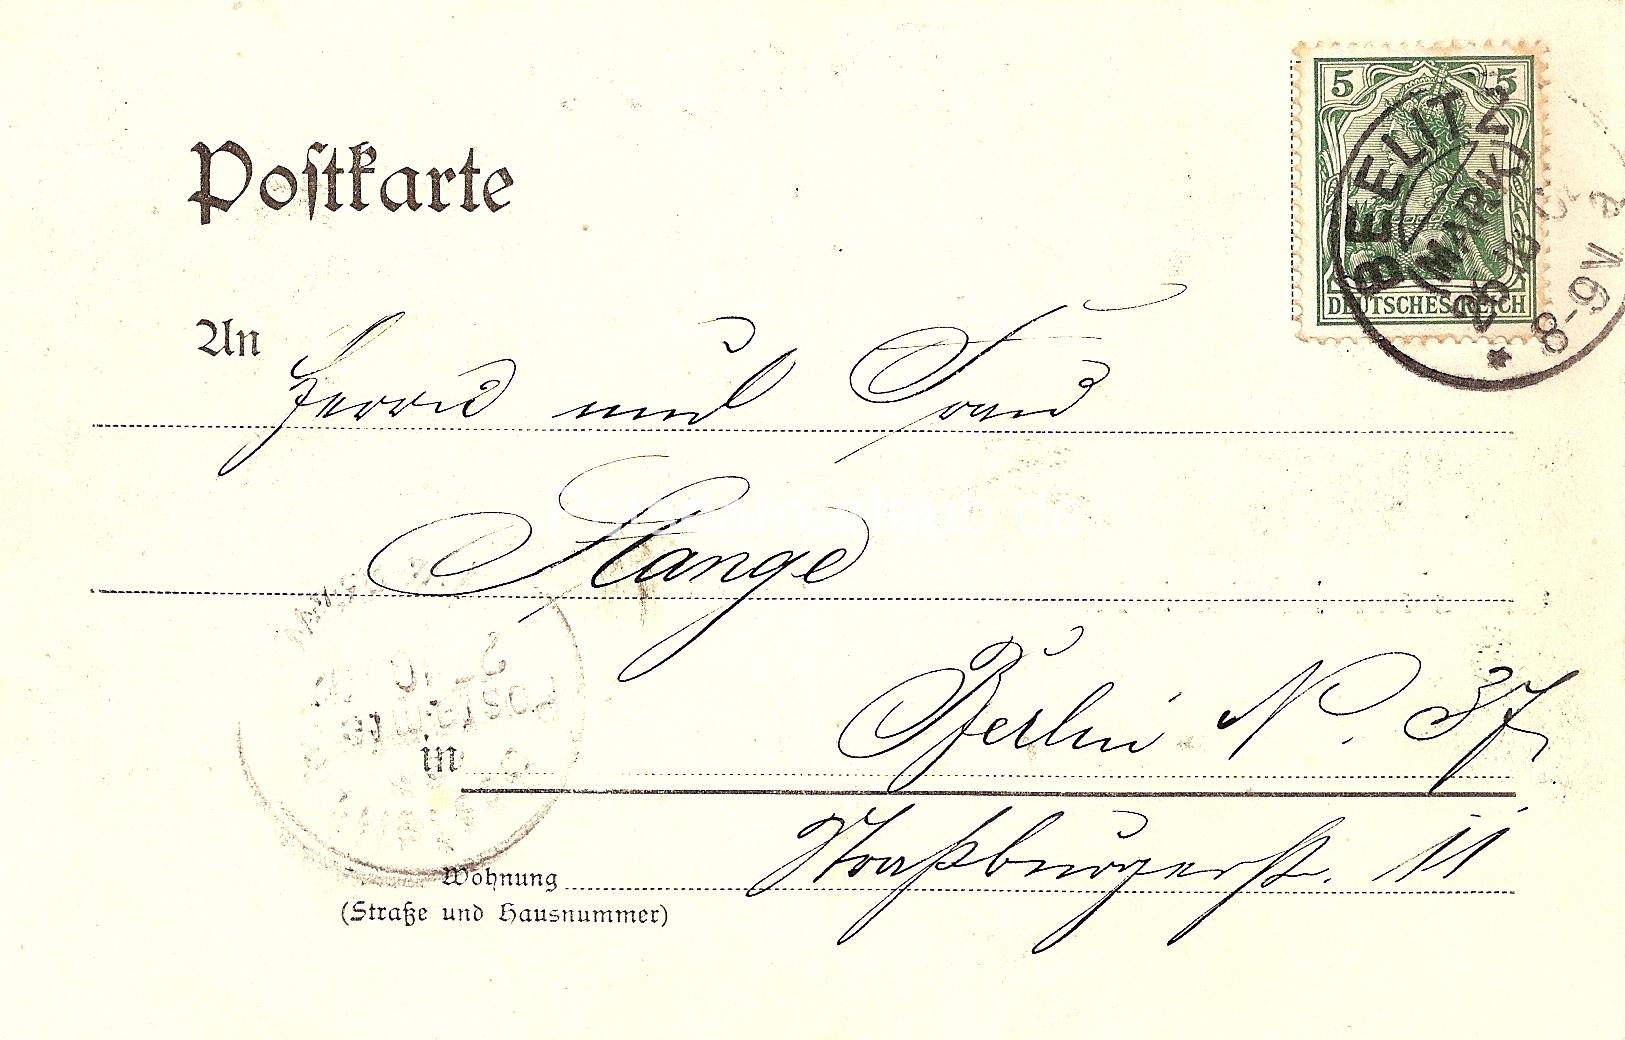 1902 10 26